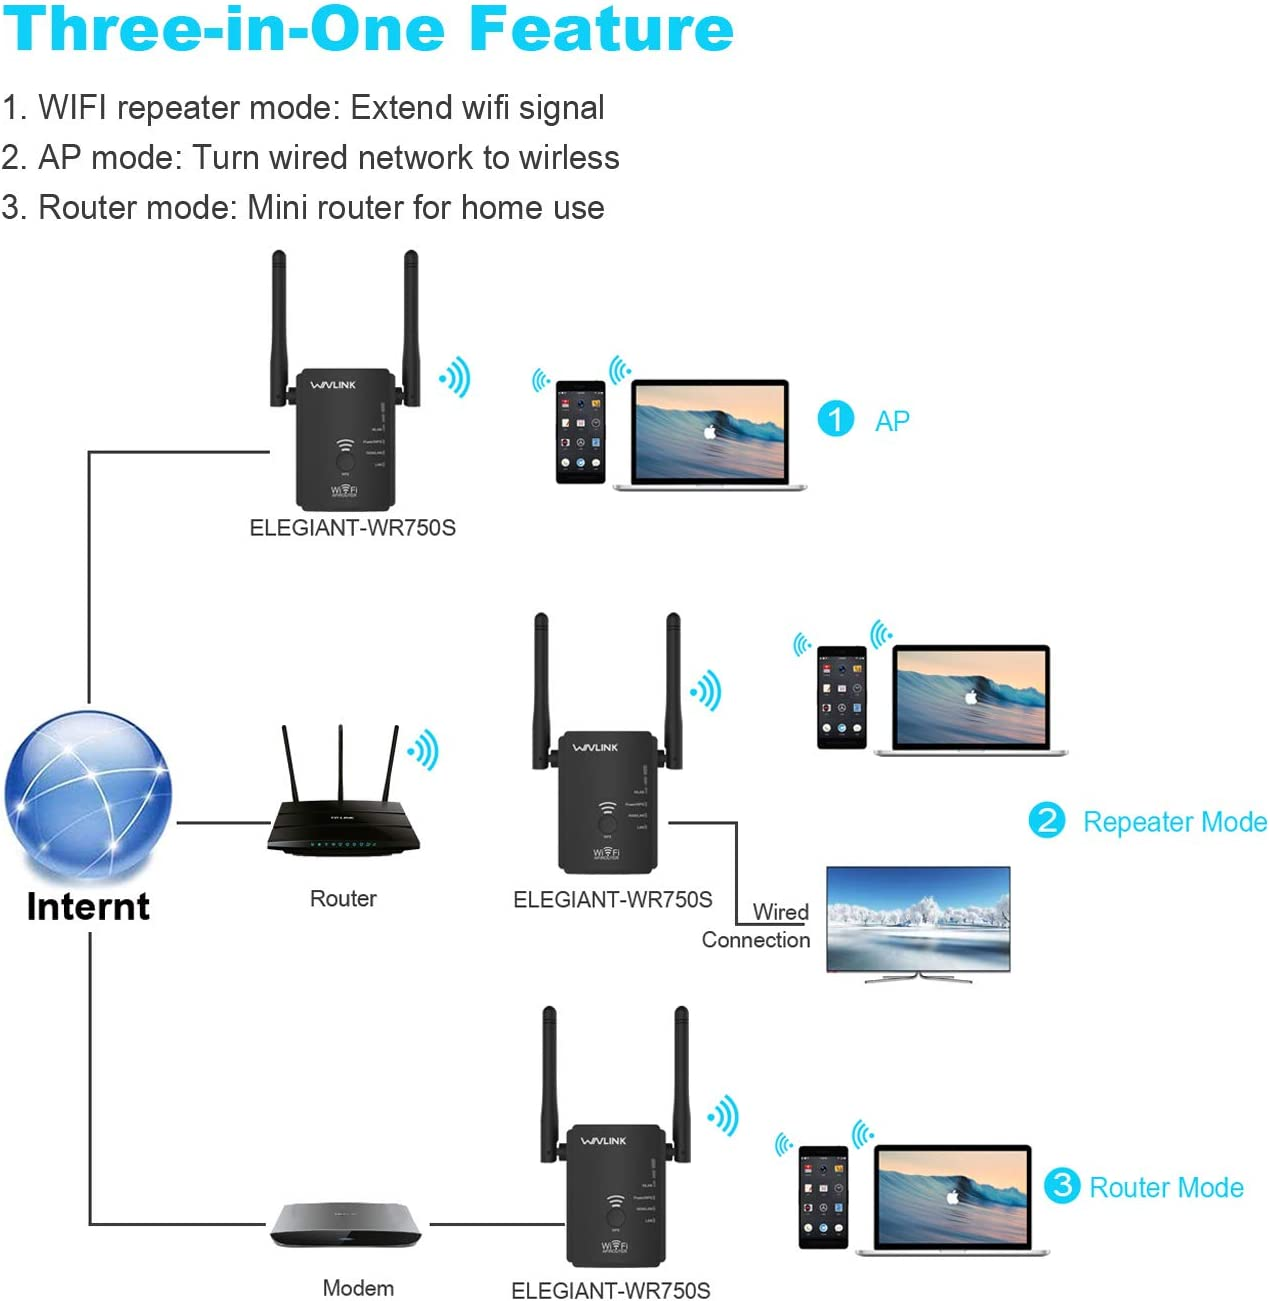 UTOPB - Repetidor de señal Wi-Fi inalámbrico de 2,4 GHz 300 Mbit/s con modo router, AP, repetidor, amplificador de señal con doble antena de alta ...